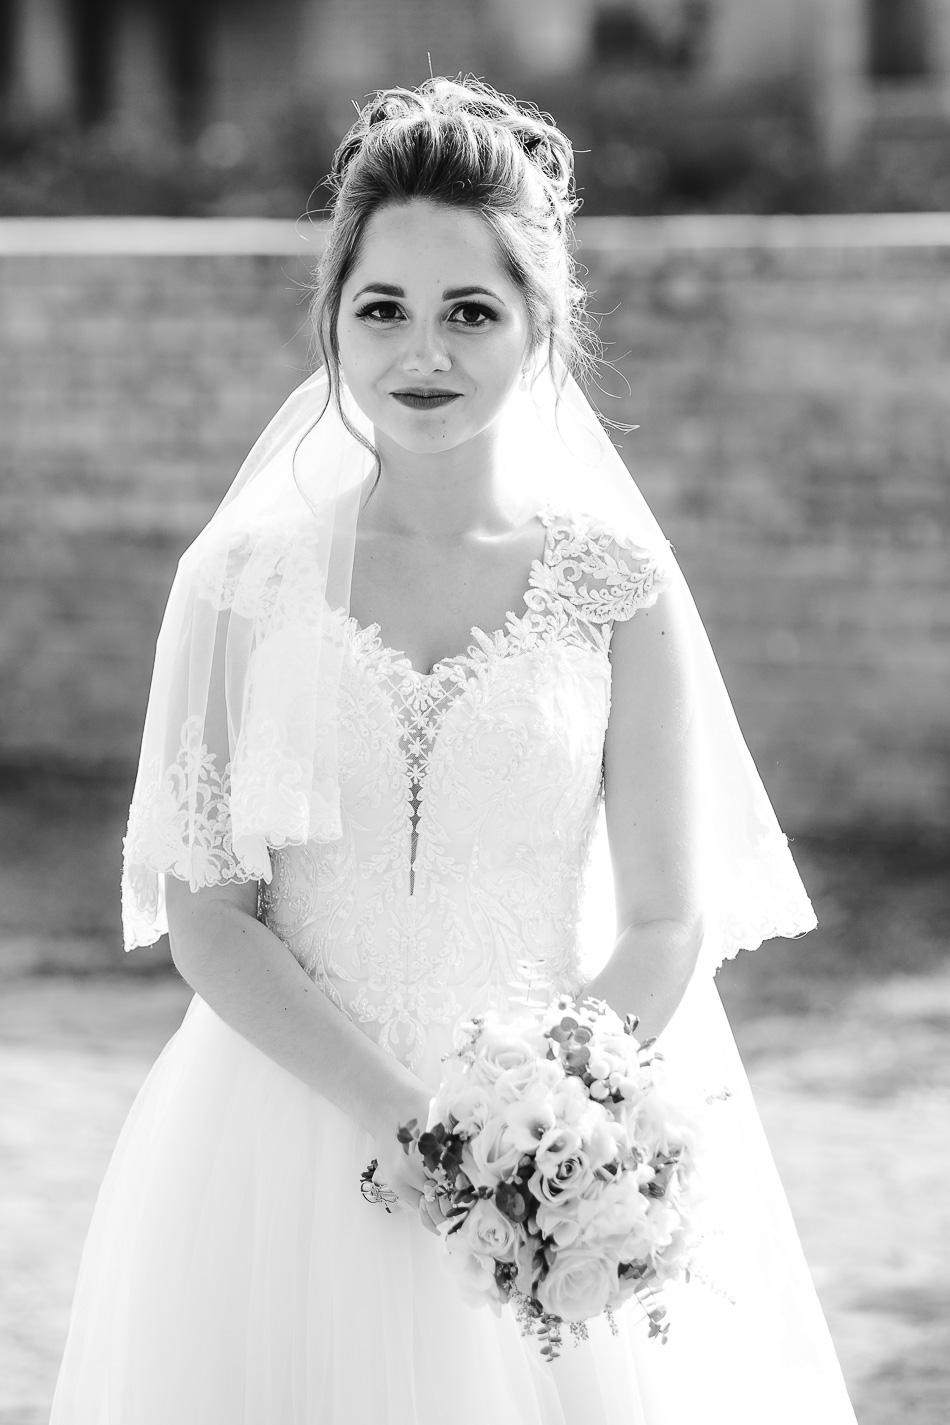 fotograf nunta targu mures profesionist cluj brasov bucuresti fotografie creativa fotografii naturale mire mireasa sedinta foto creativitate